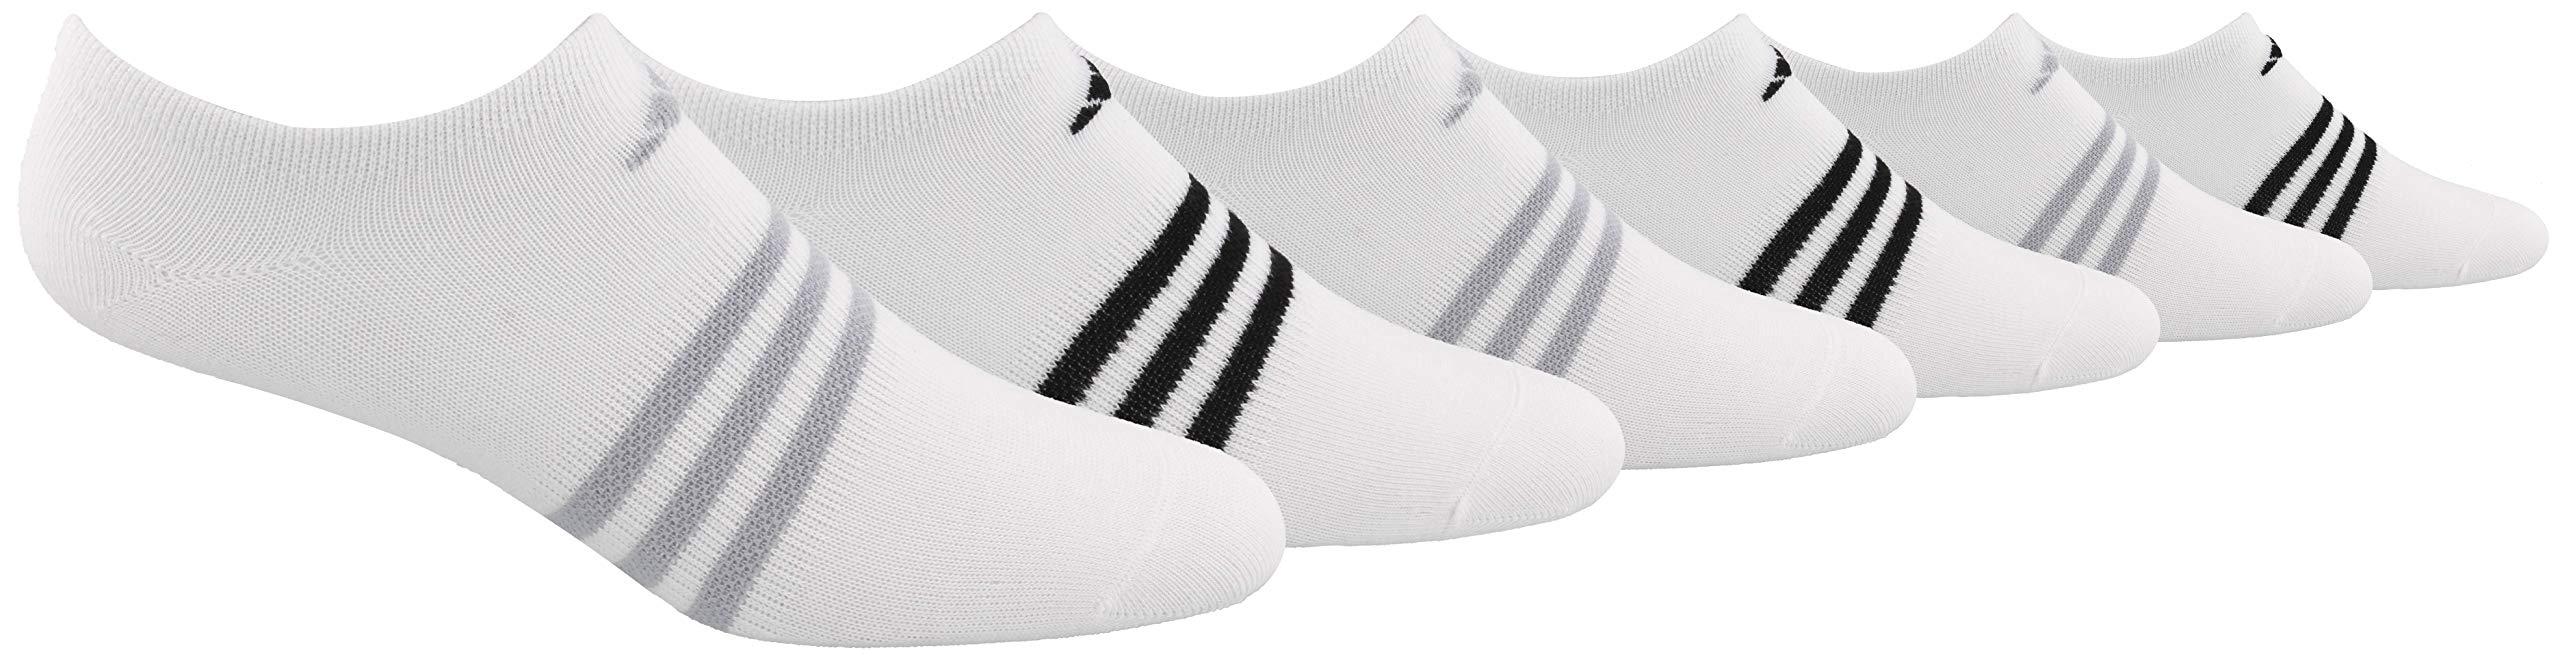 adidas Women's Superlite No Show Socks (6-Pair), White/Clear Onix/Black, Medium, (Shoe Size 5-10) by adidas